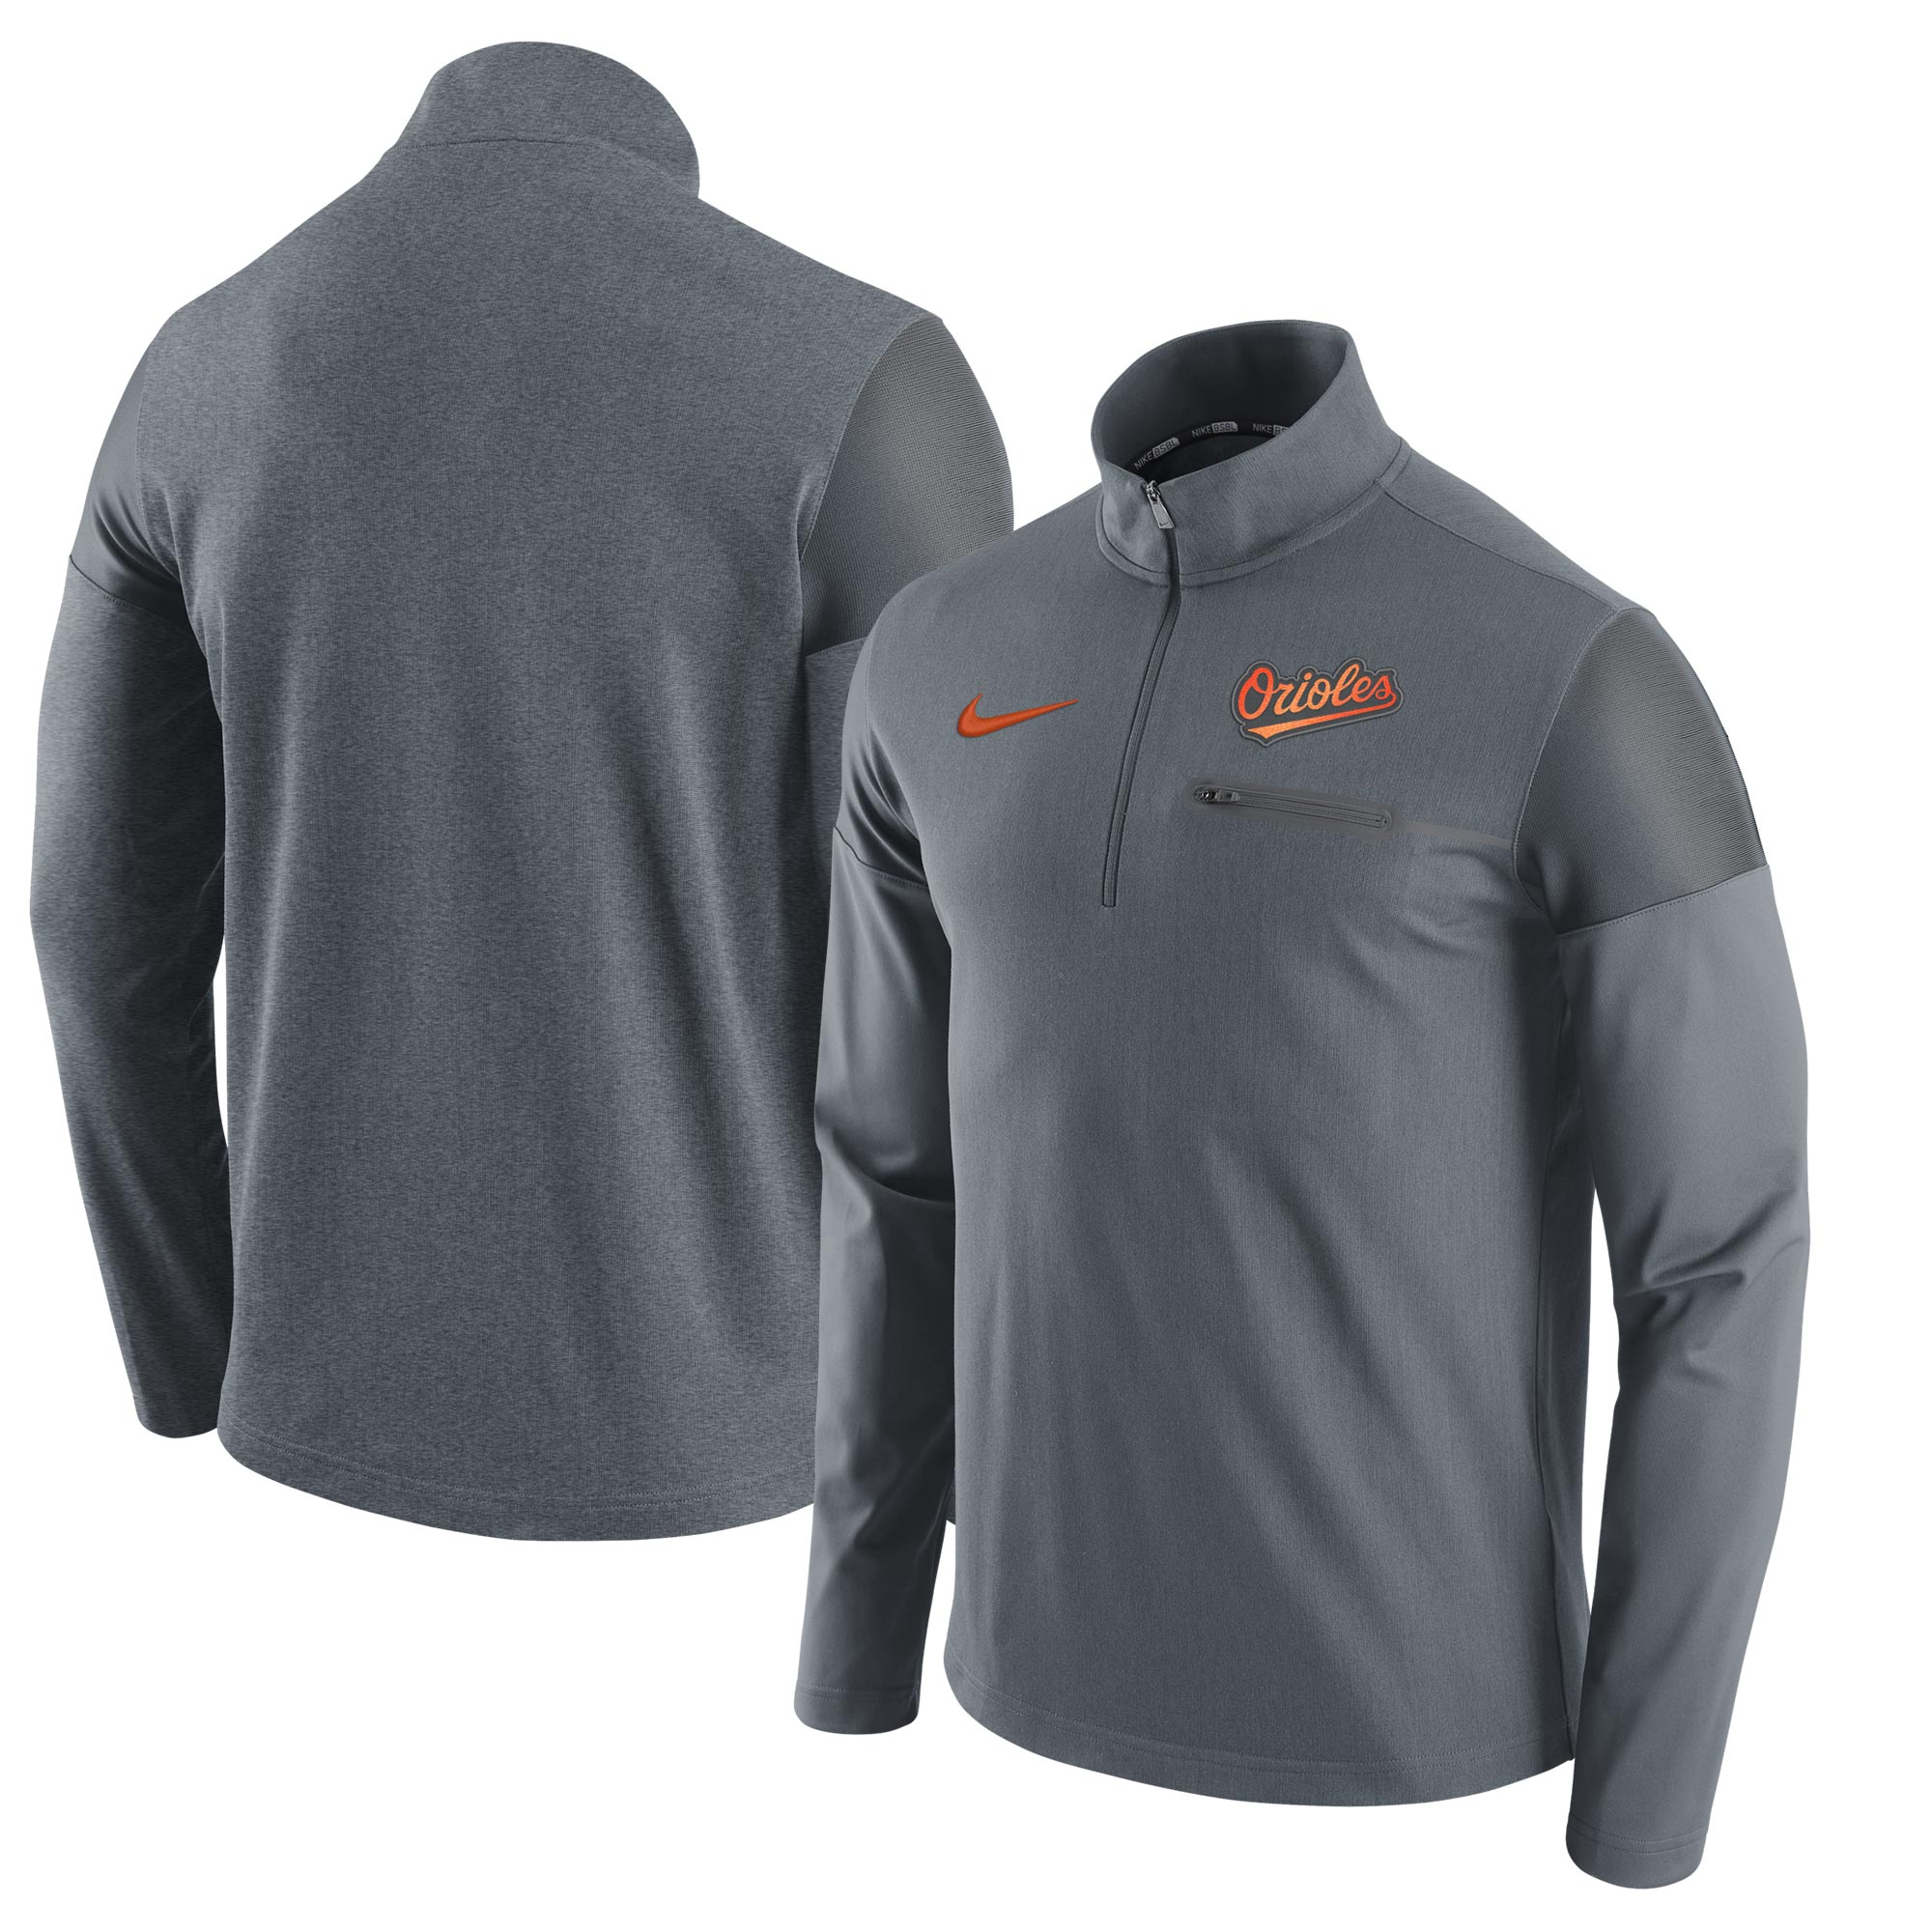 Baltimore Orioles Nike Elite Half-Zip Pullover Jacket - Gray